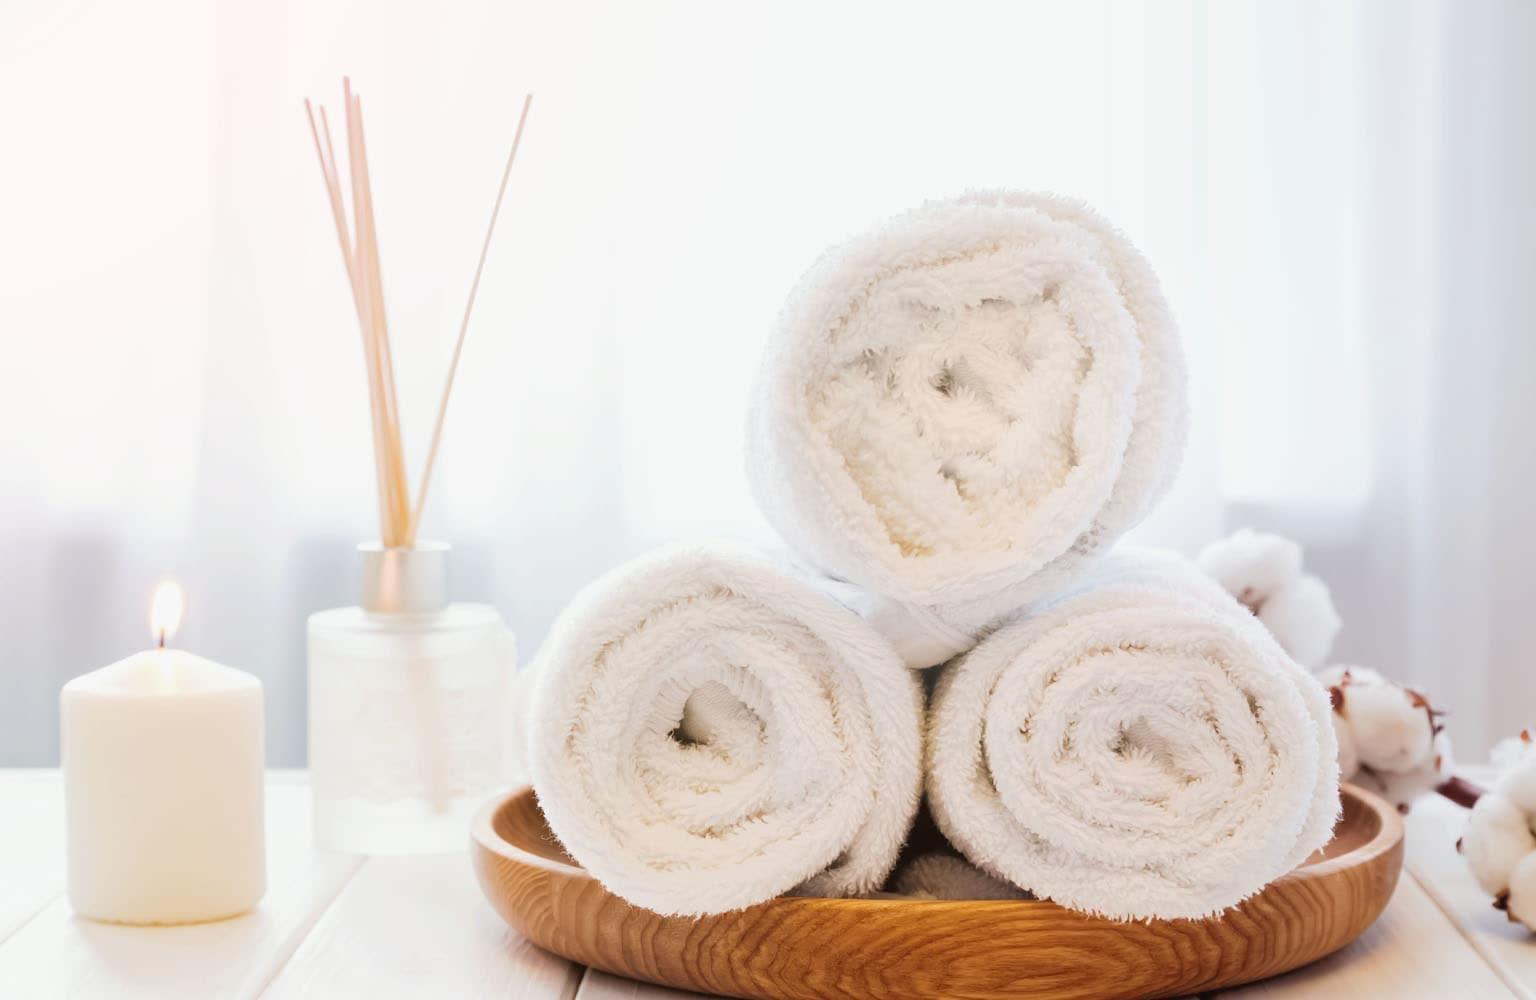 Acupressure and Massage